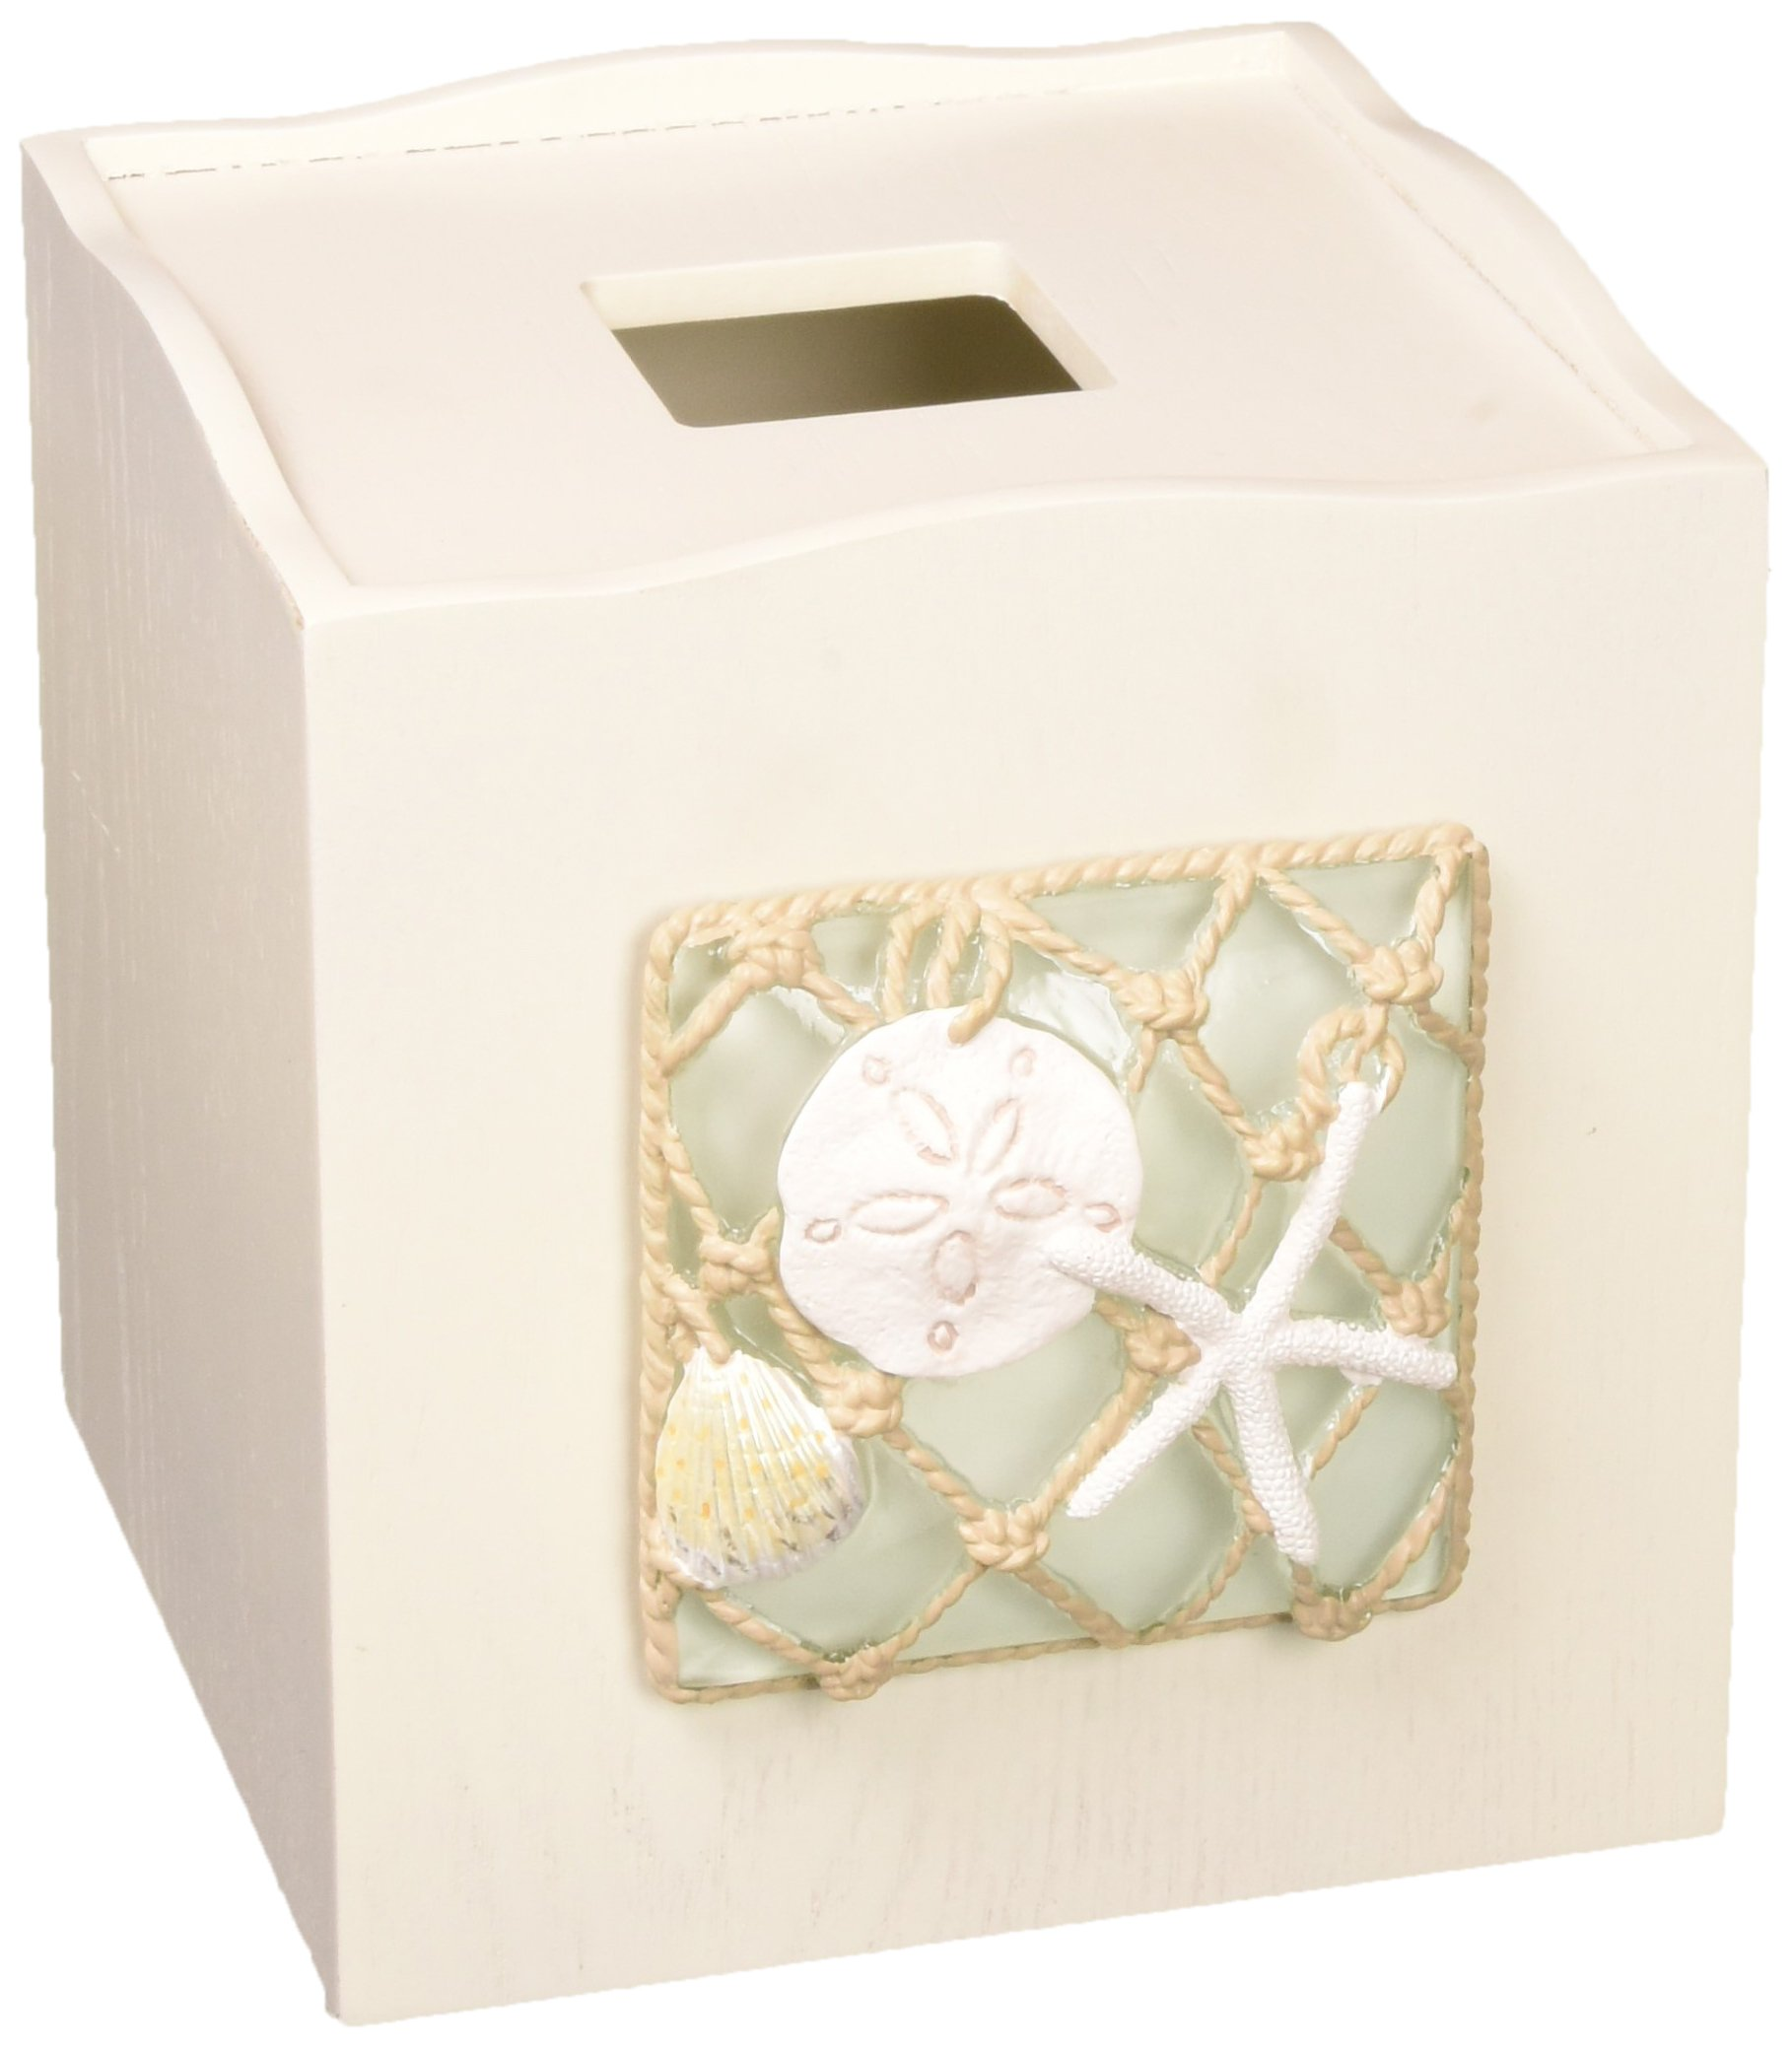 Avanti Linens Seaglass Tissue Cover, Medium, Multicolor